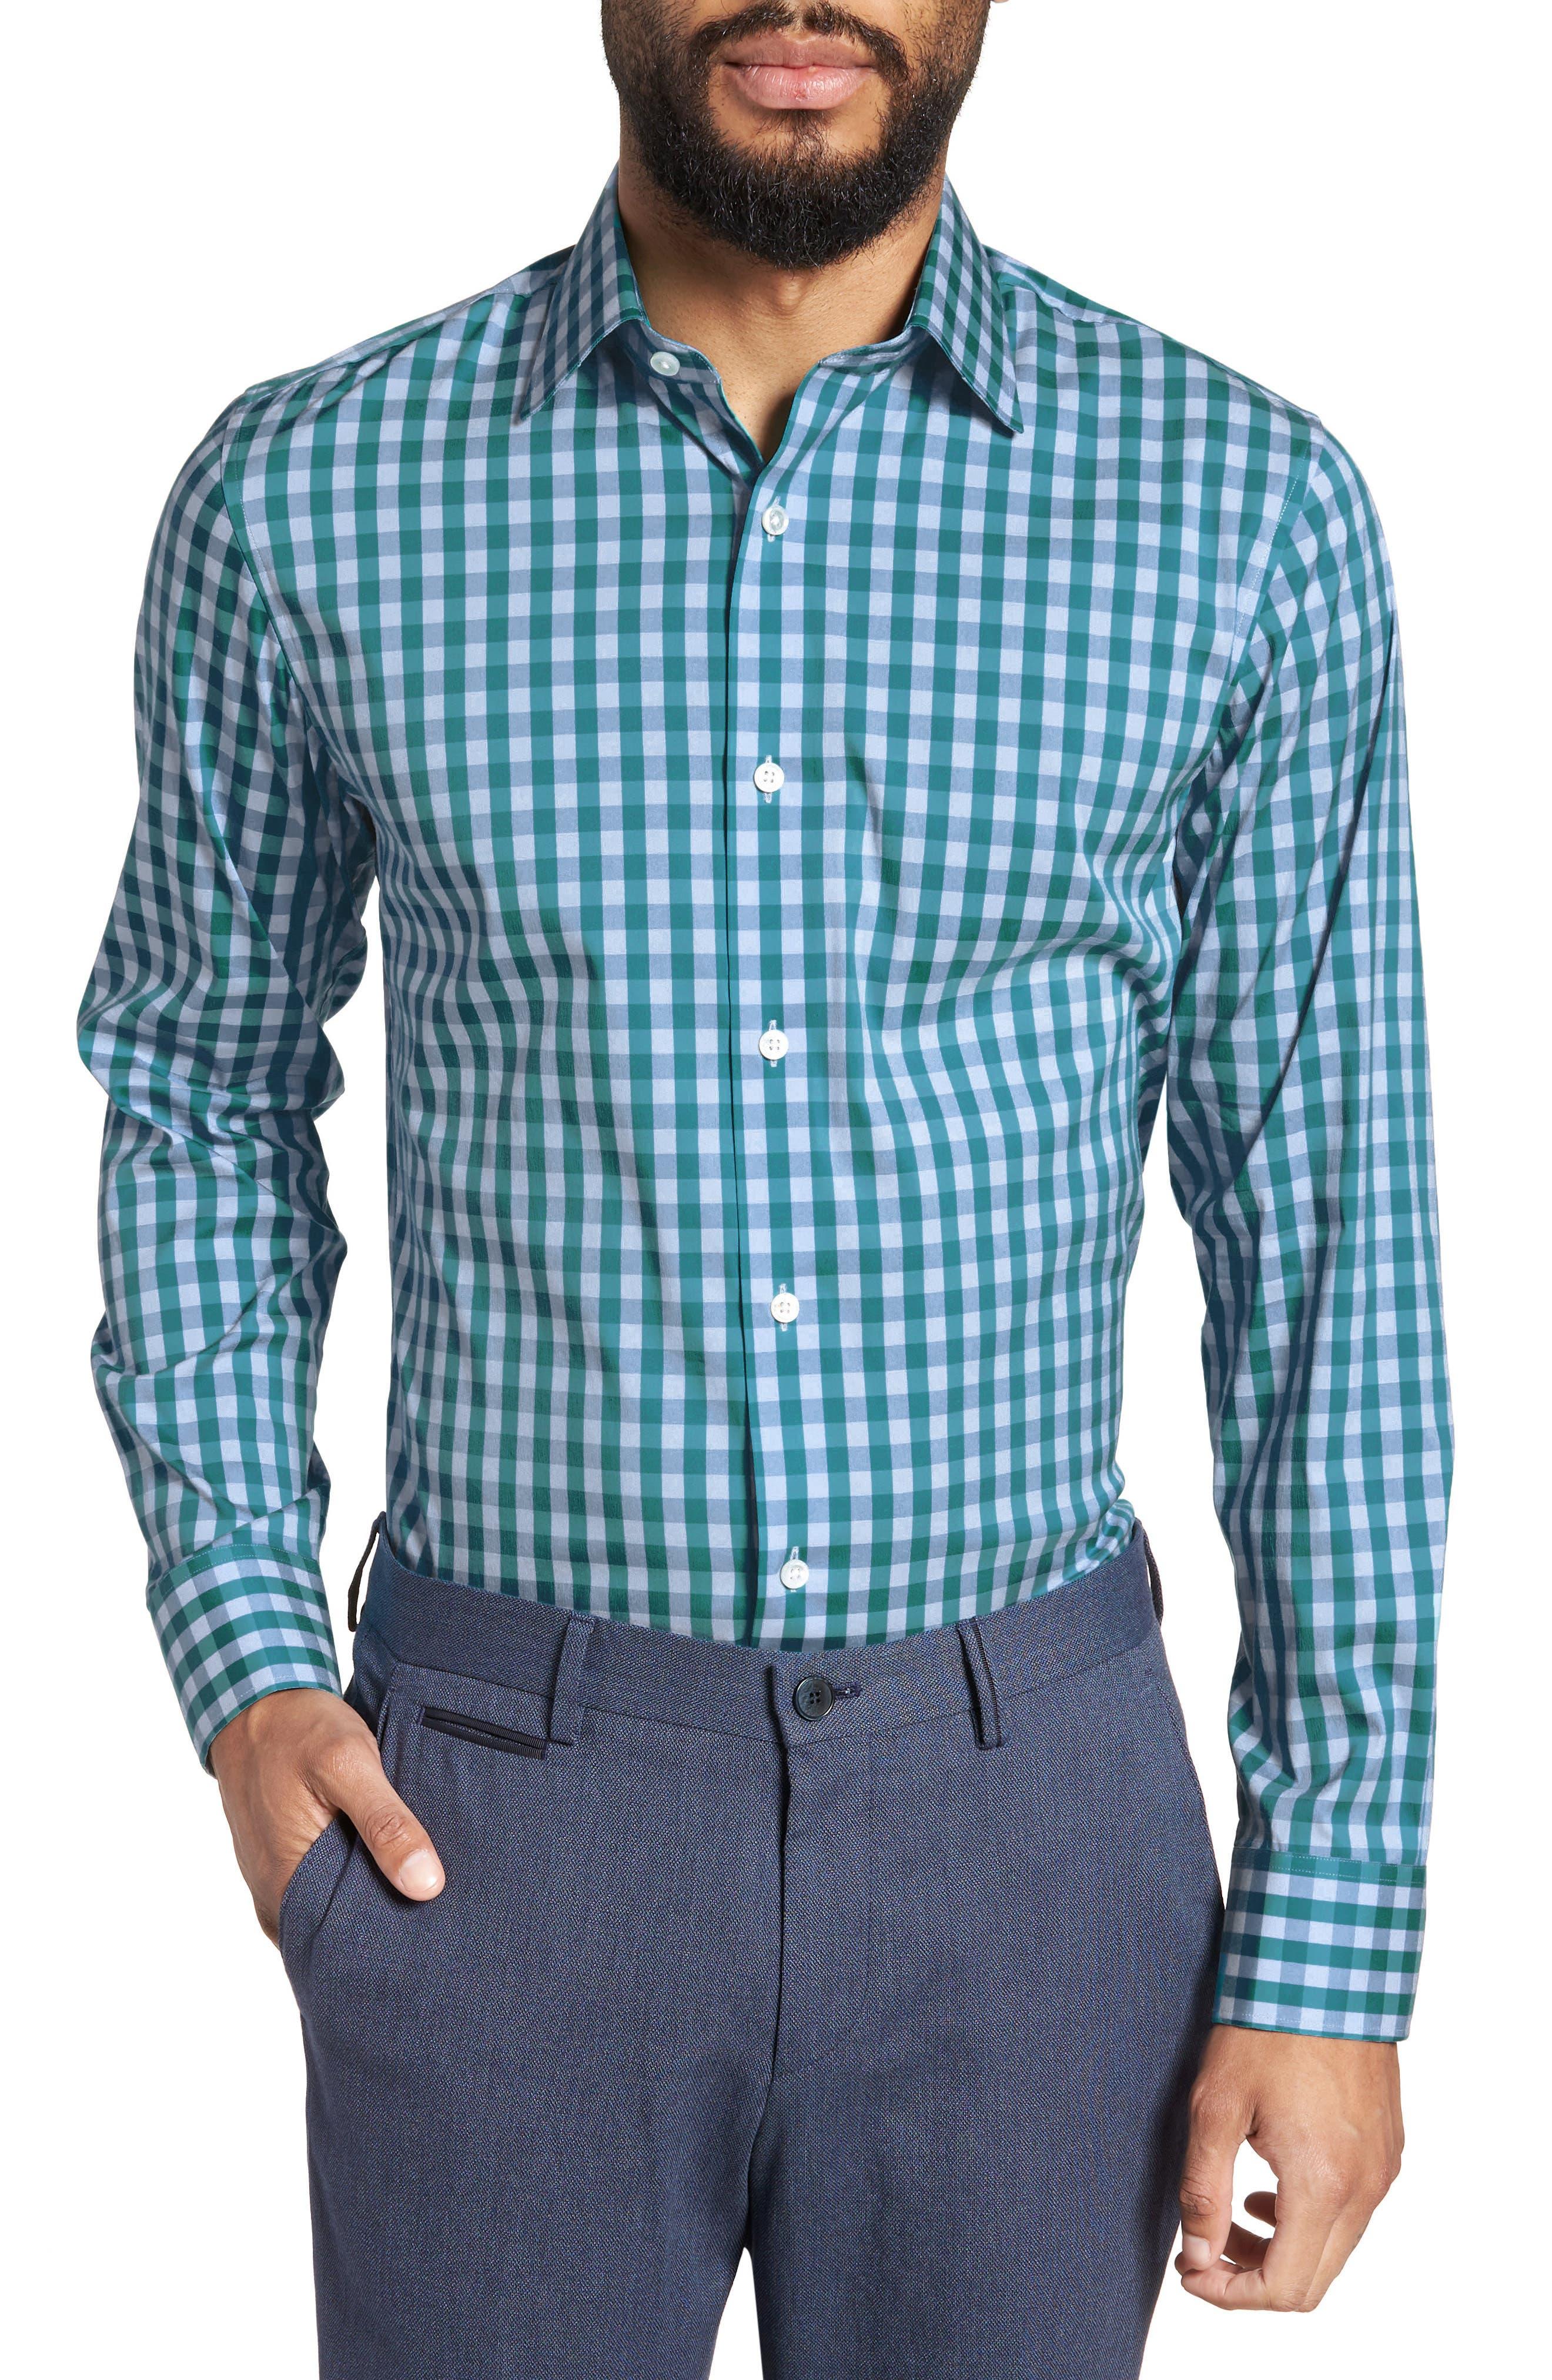 Port Grand Slim Fit Stretch Check Dress Shirt,                         Main,                         color, TEAL